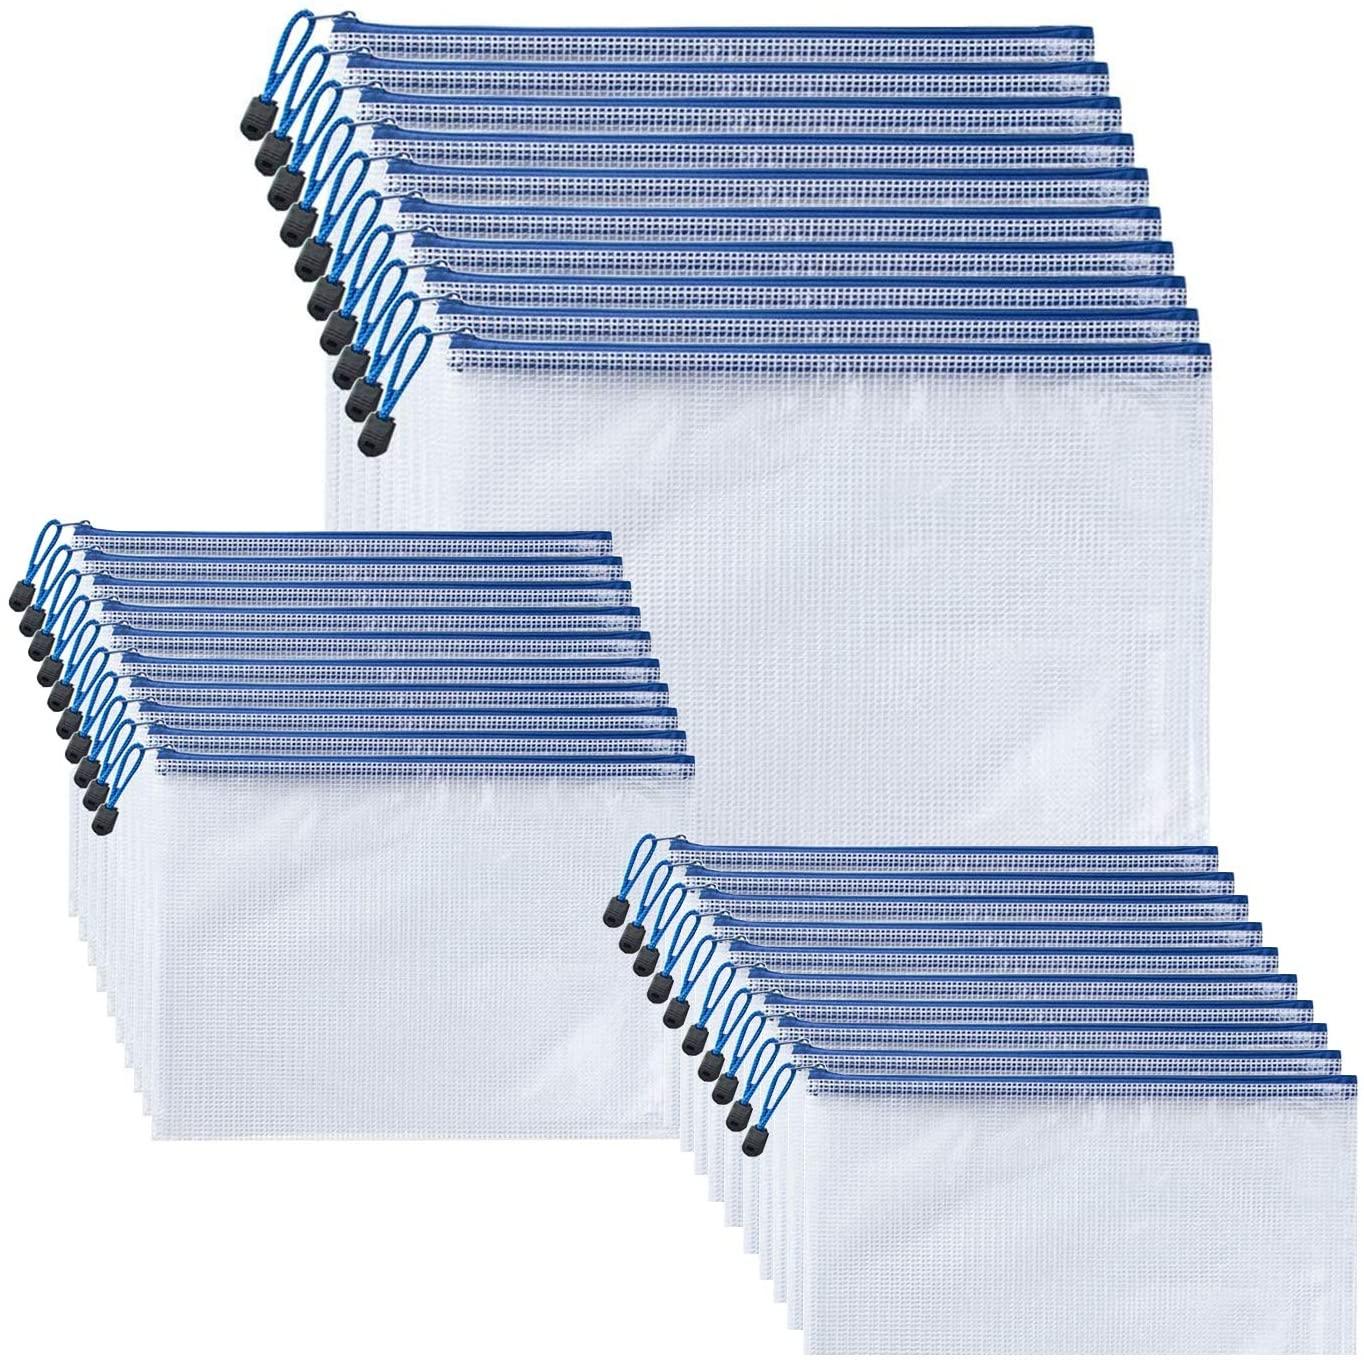 ZucpBF 36 Packs Zipper Envelope Pouch, Mesh Zipper Pouch Document Bag, Zippered File Bag Storage for Office Document,Plastic Zip File Folders, Zipper File Bags,A4,A5,Bill